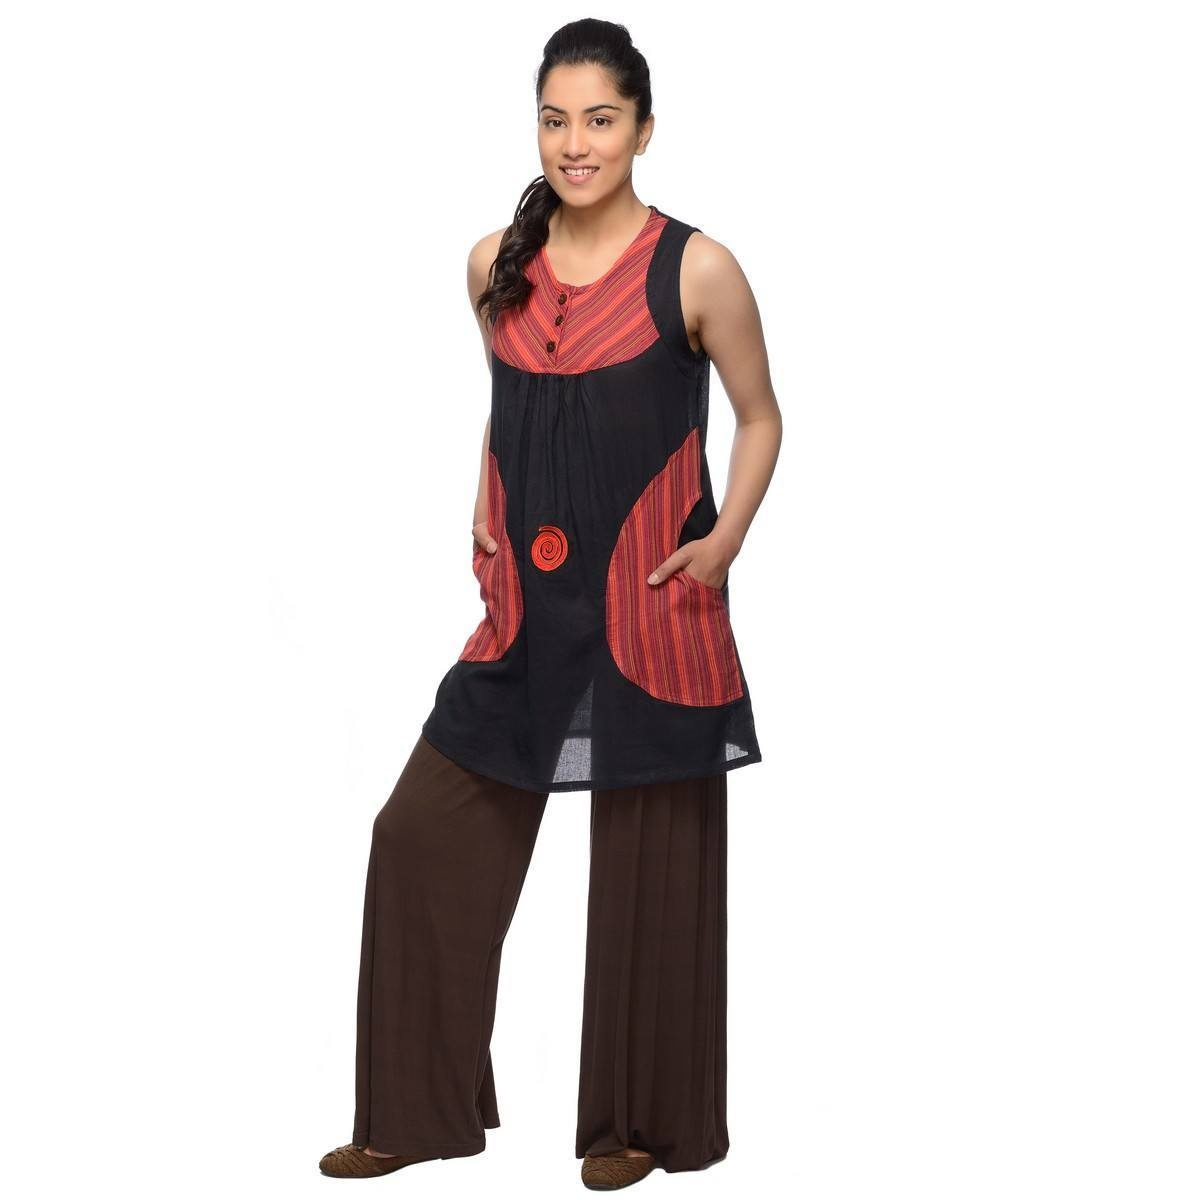 Ärmellos Bluse Oberteil Kleid Top lang Träger Tank Shirt Hippie Goa Boho Tunika